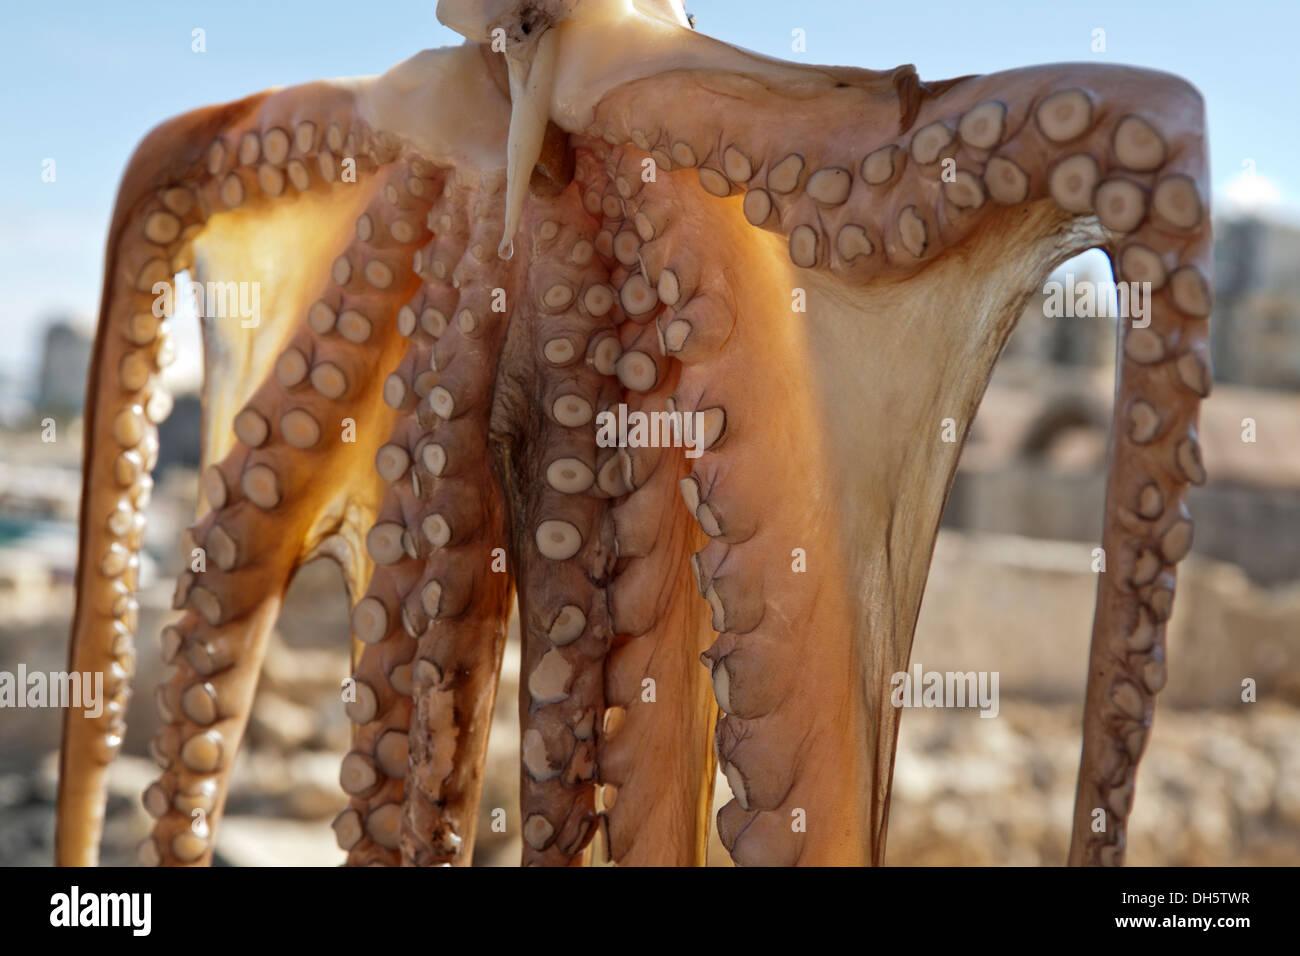 Octopus for sale in the Venetian harbor of Heraklion, Heraklion region, Crete, Greece. - Stock Image